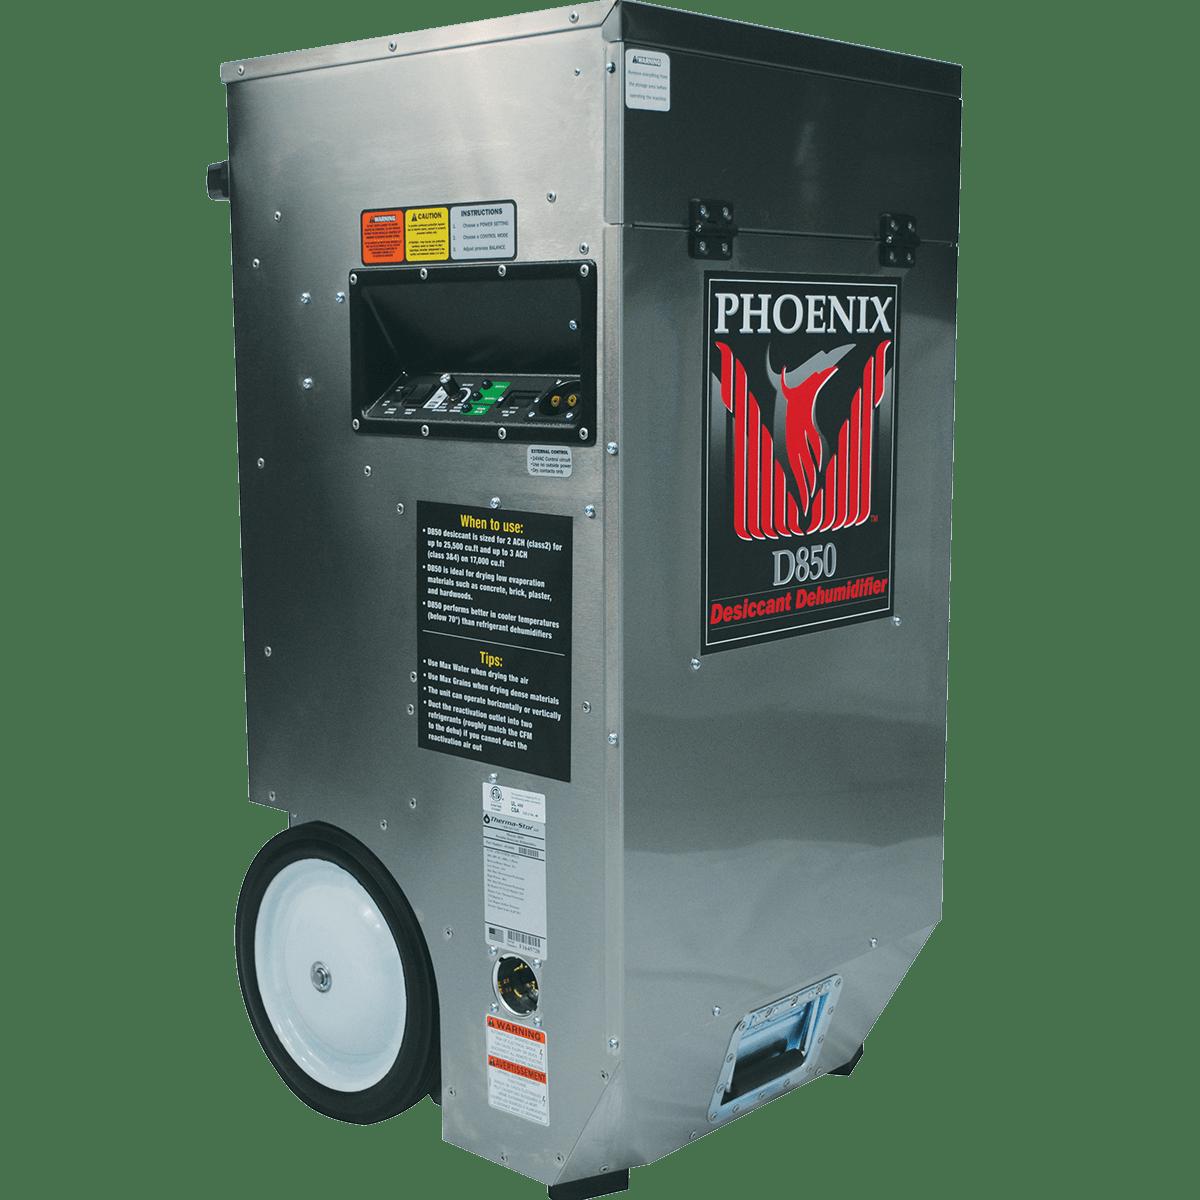 Phoenix D850 Desiccant Dehumidifier Sylvane